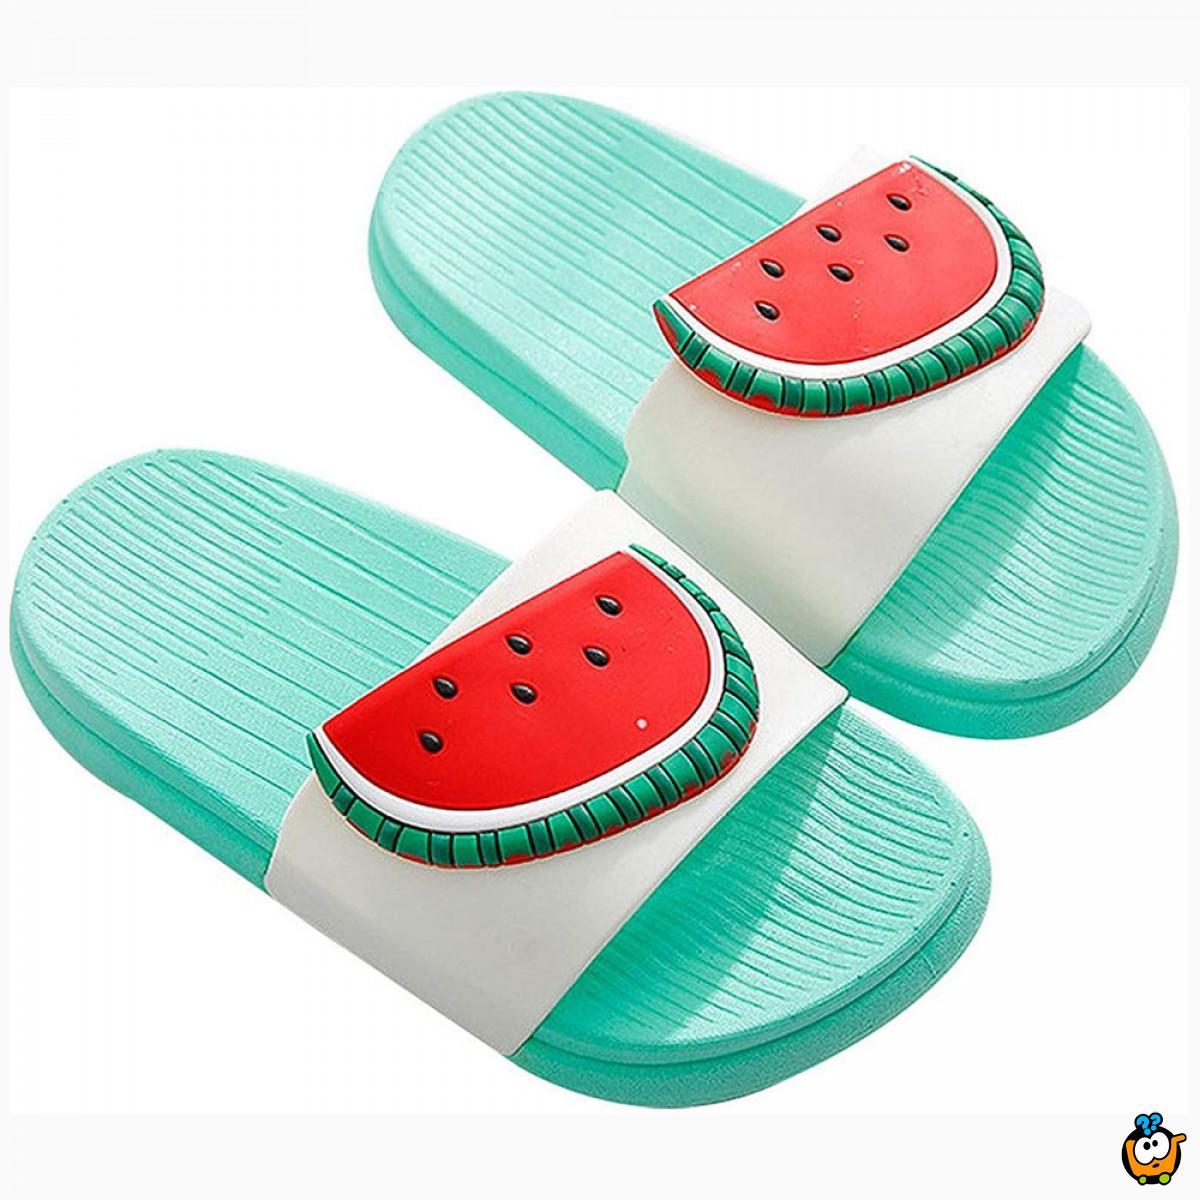 Mint papuče za decu sa dezenom lubenice